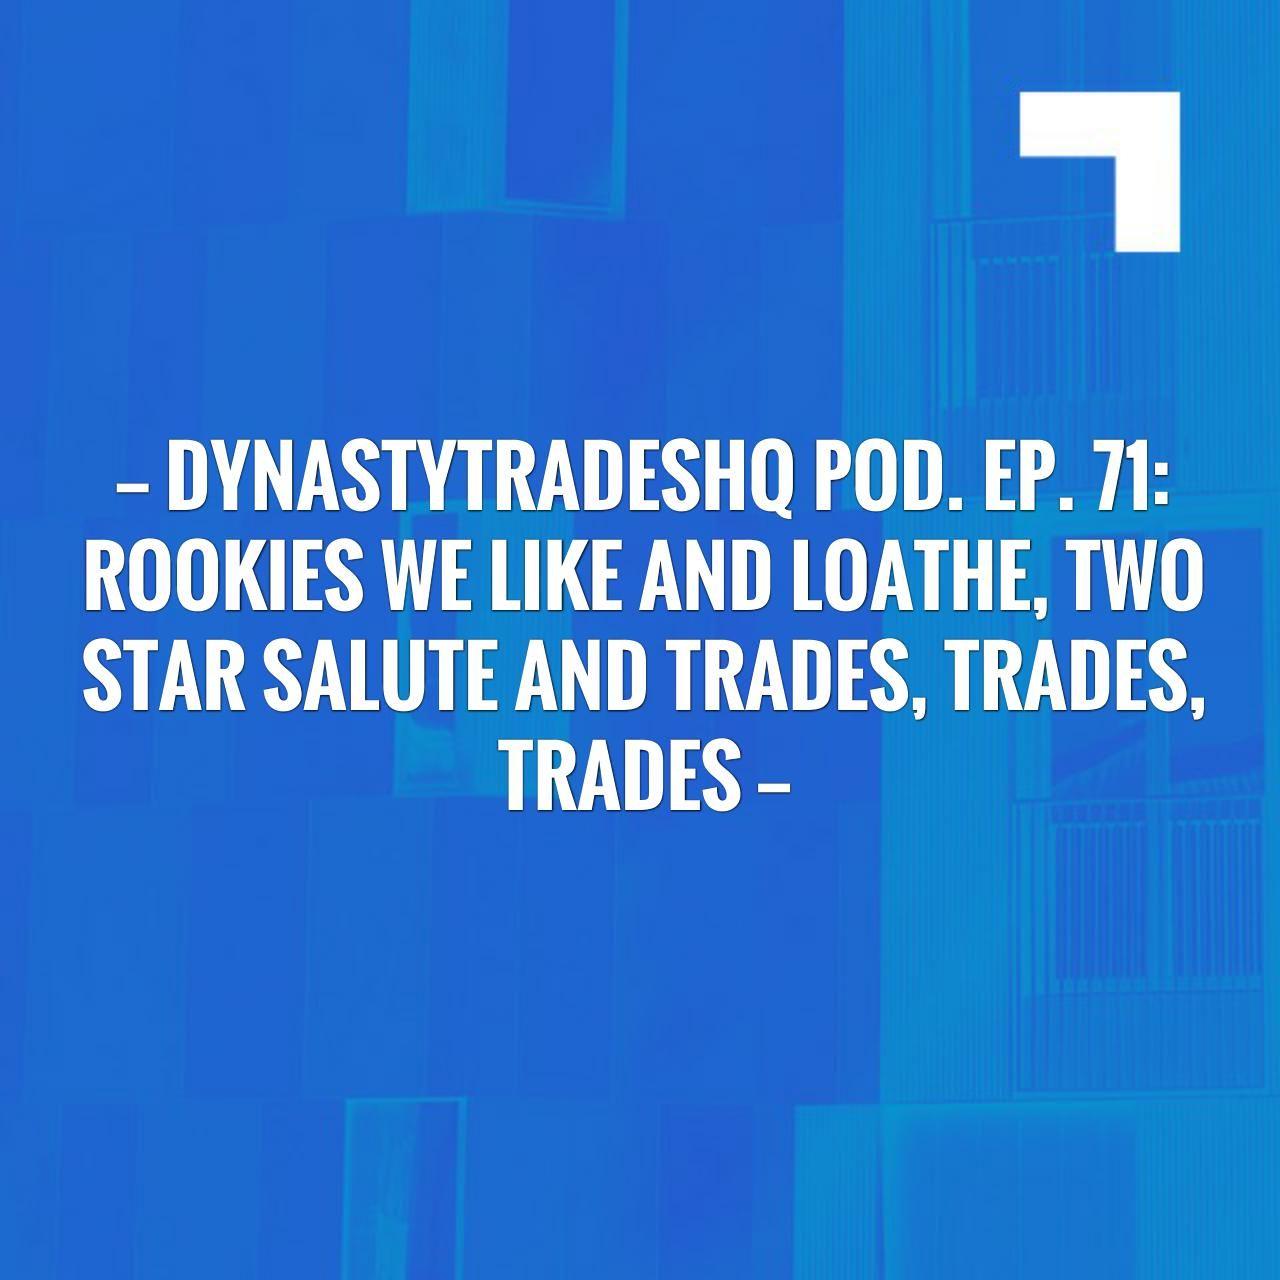 Dynastytradeshq pod ep 71 rookies we like and loathe